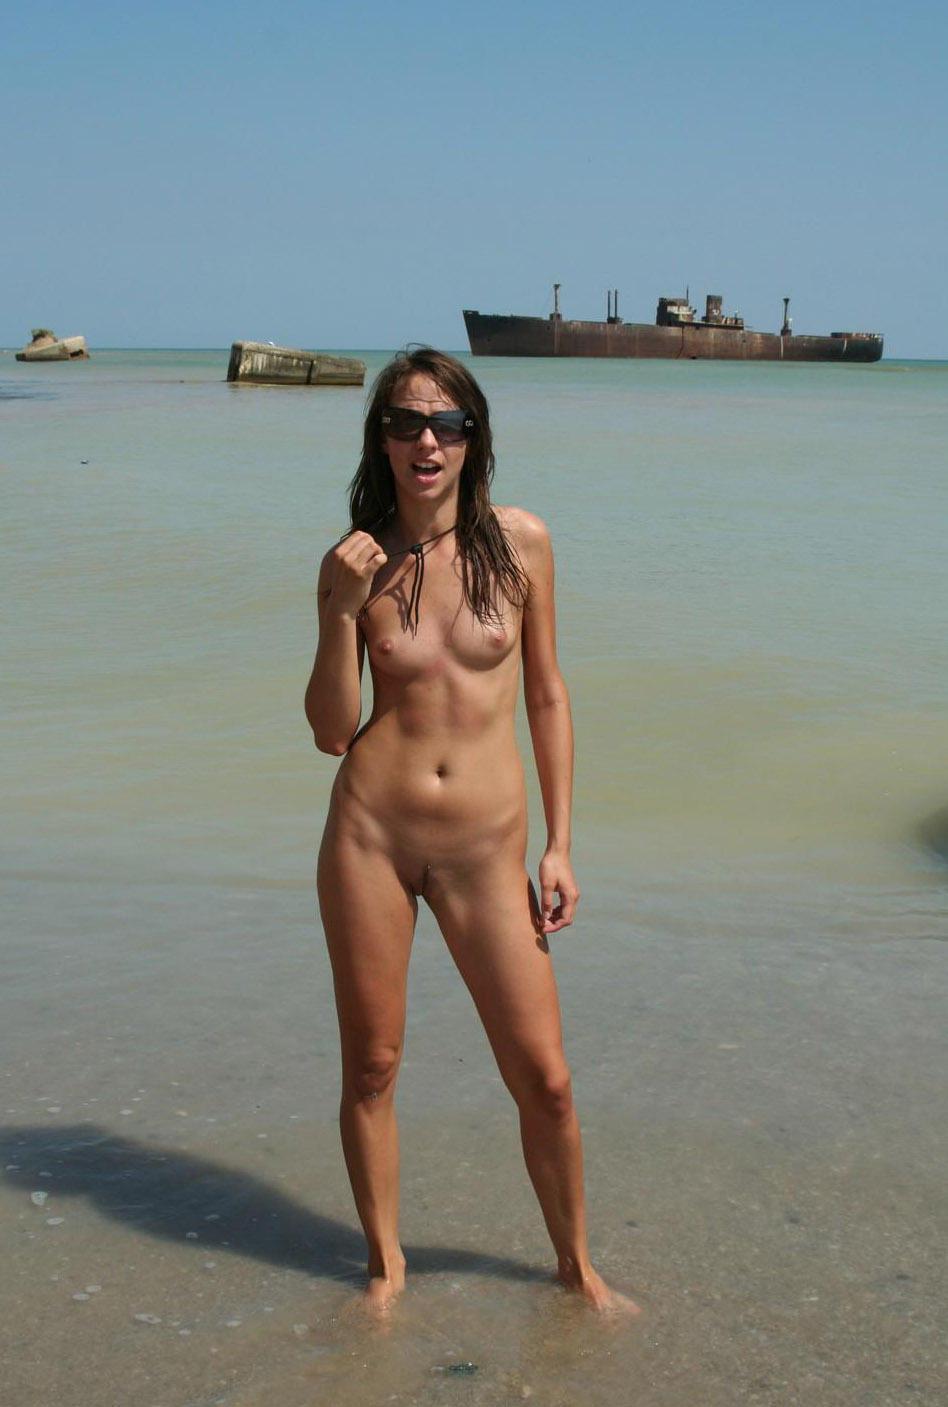 Nudist beach babe exposing her naked body